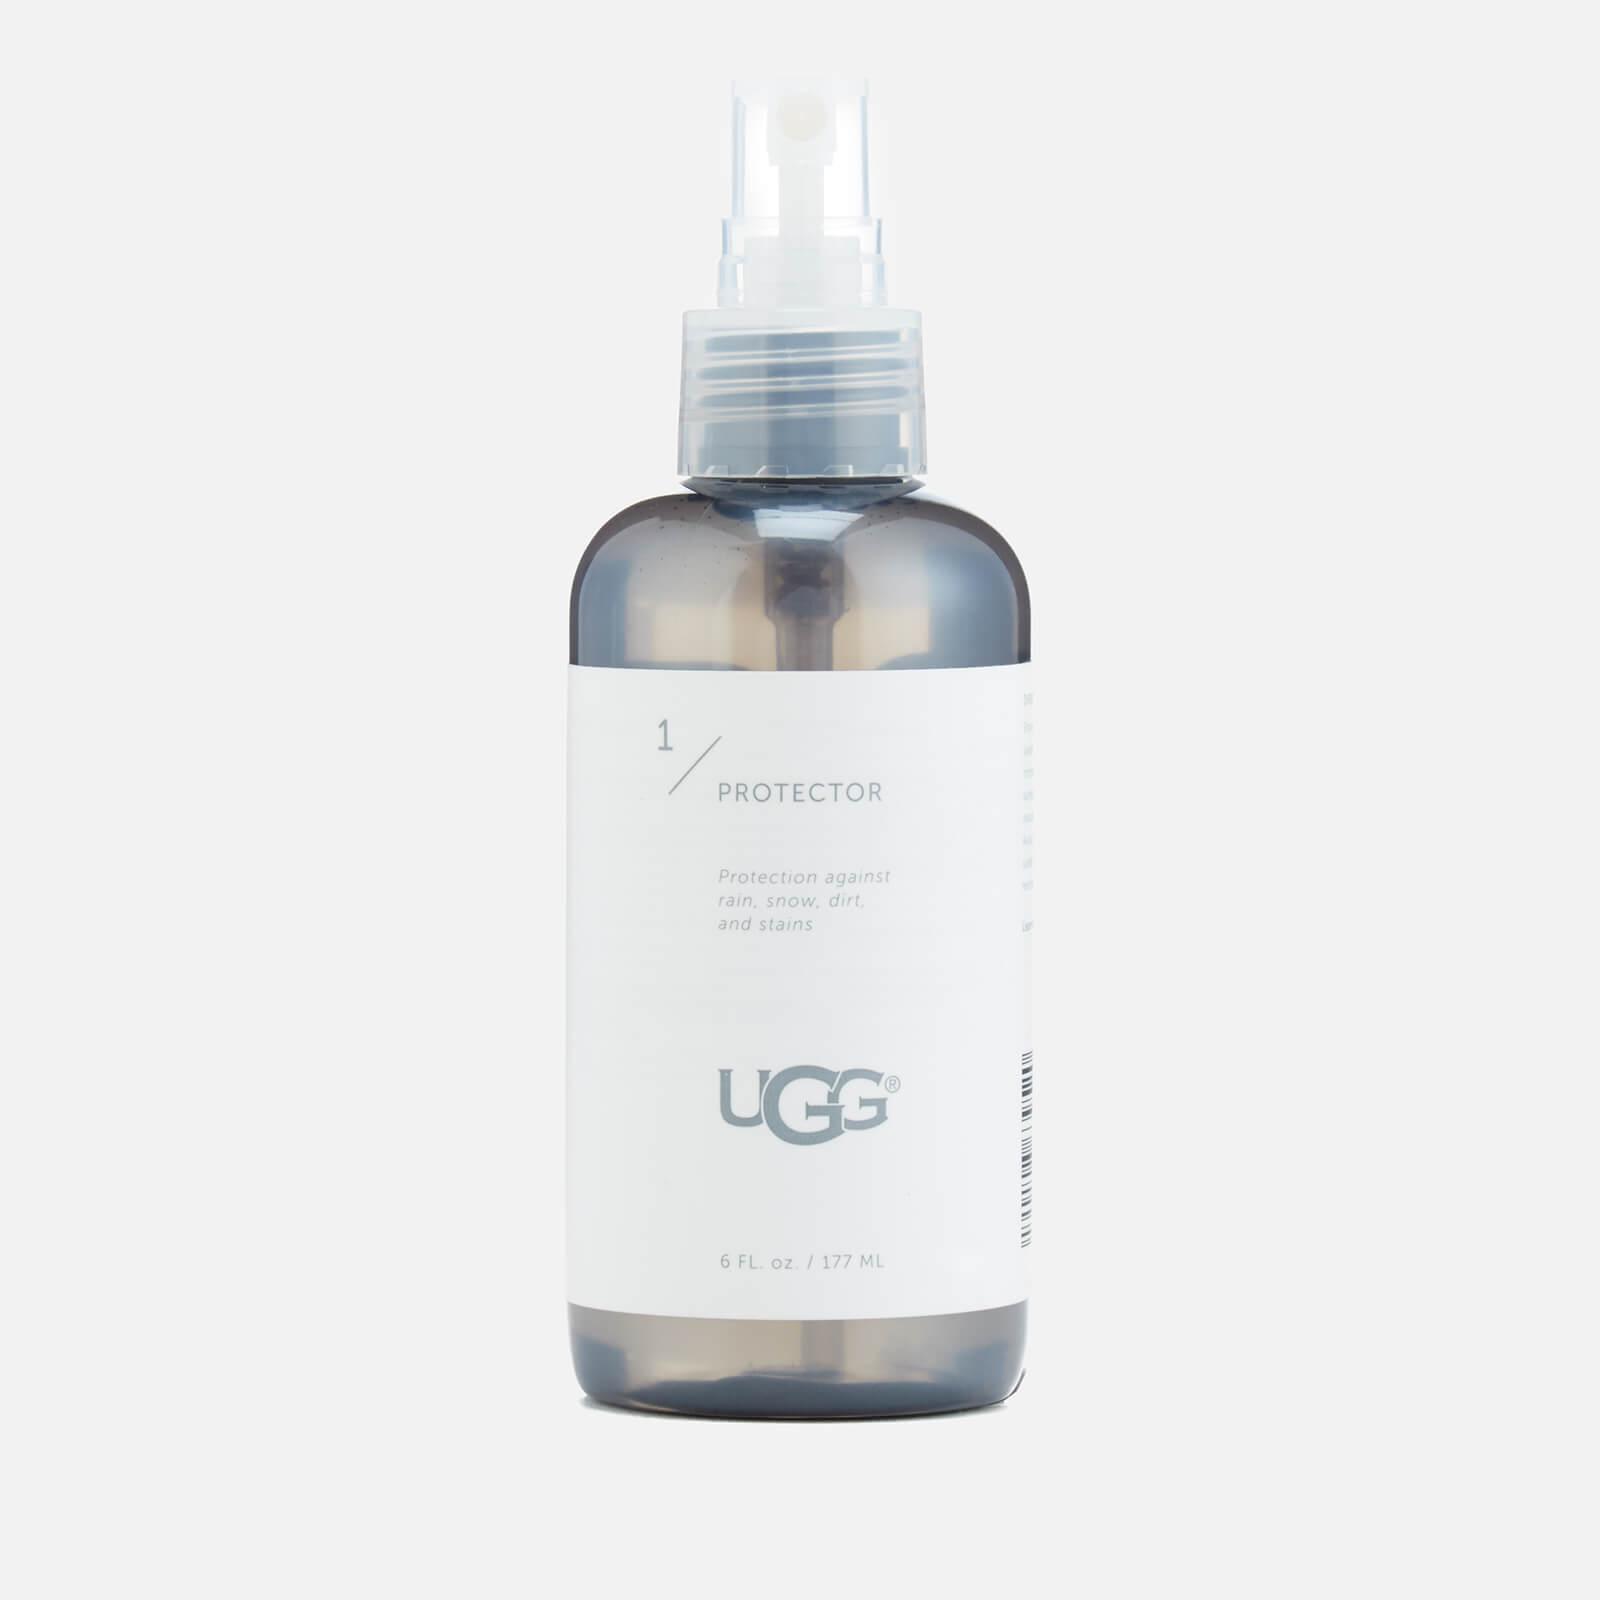 UGG Protector Spray - White